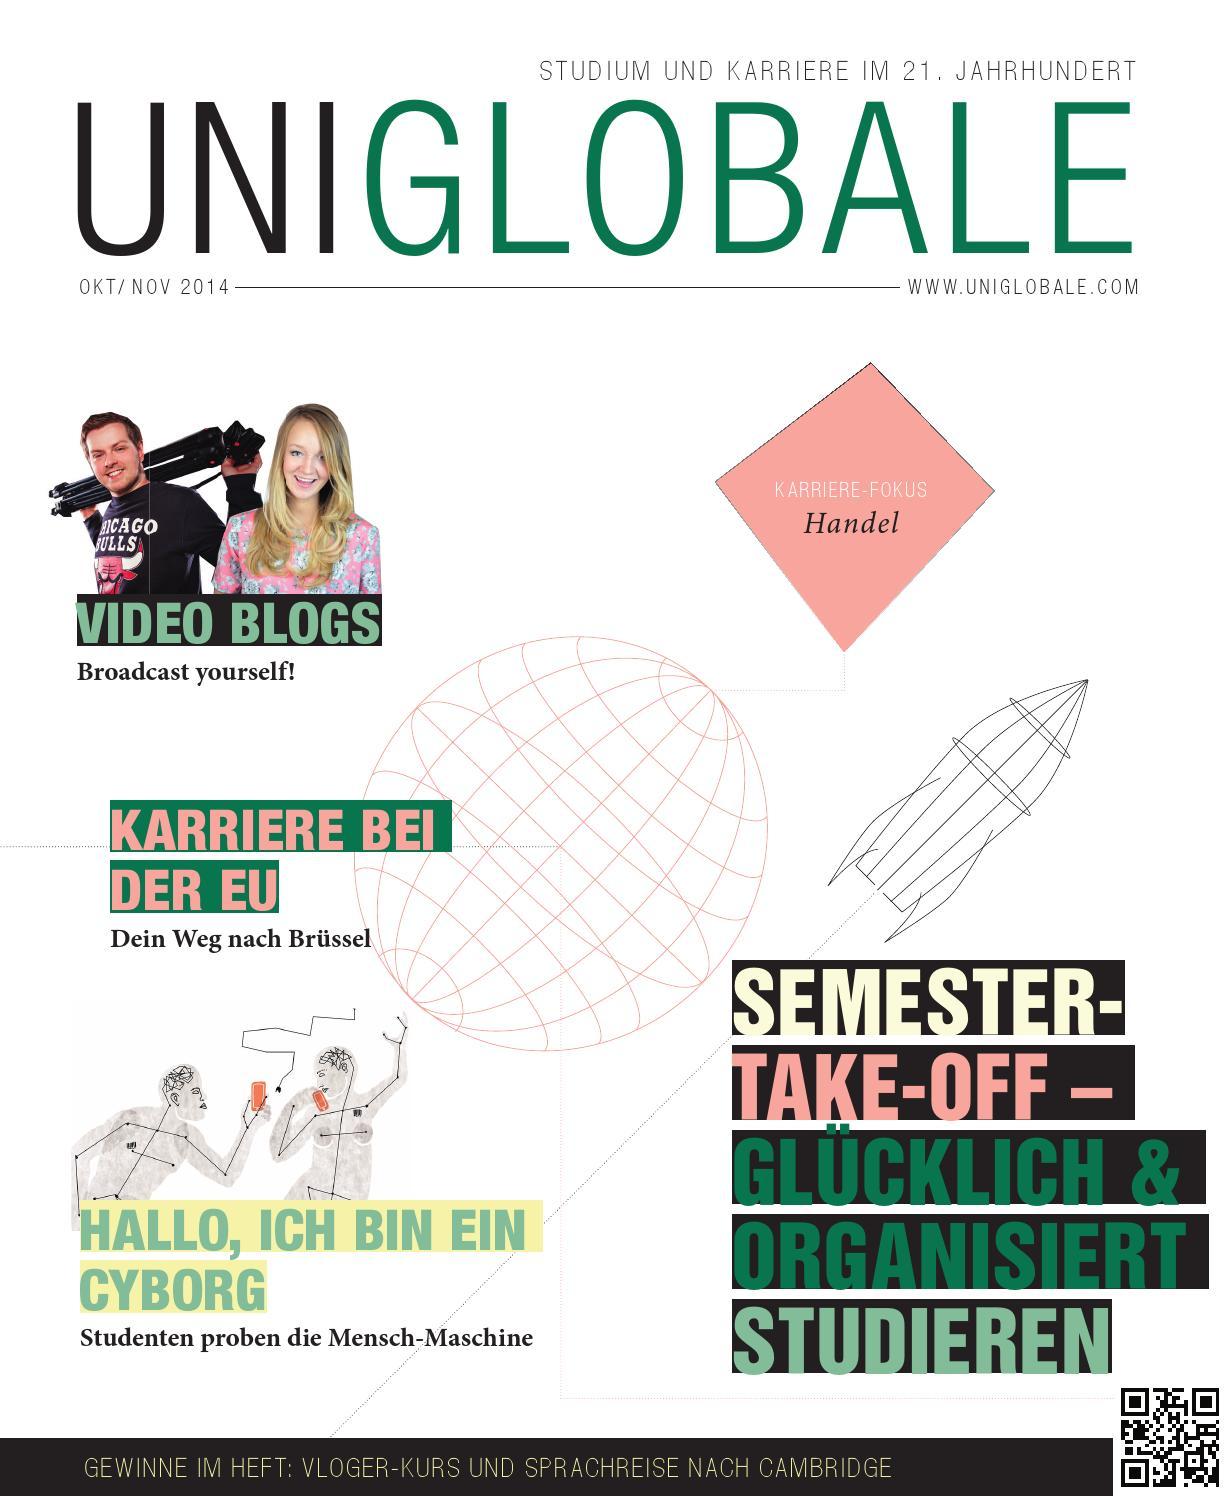 UNIGLOBALE OKT / NOV 2014 by Uniglobale - issuu